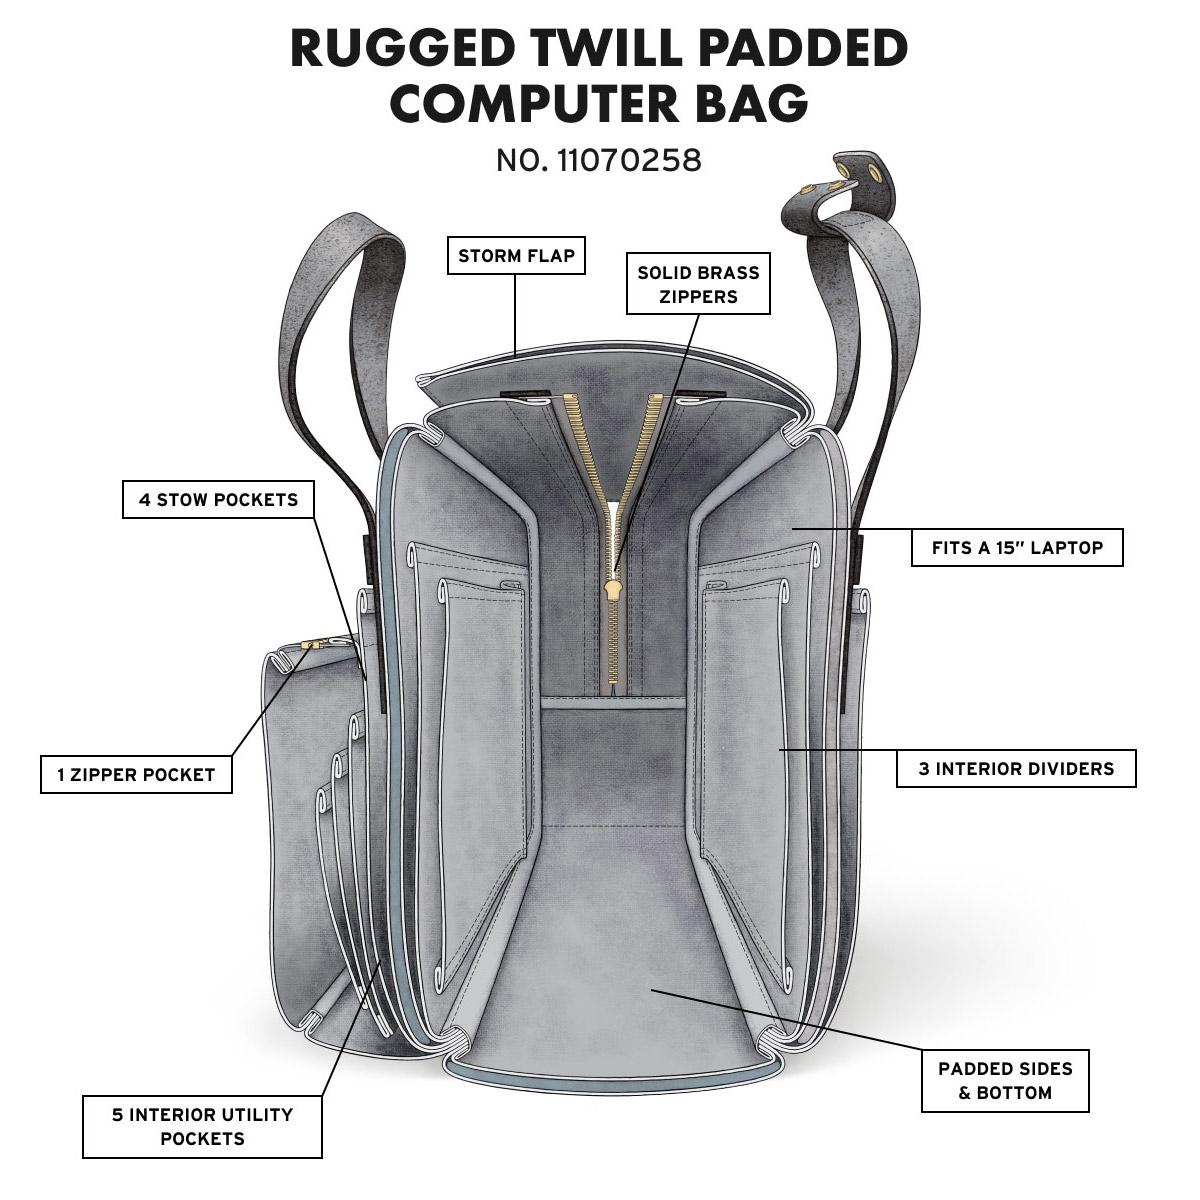 Filson Padded Computer Bag extra informatie